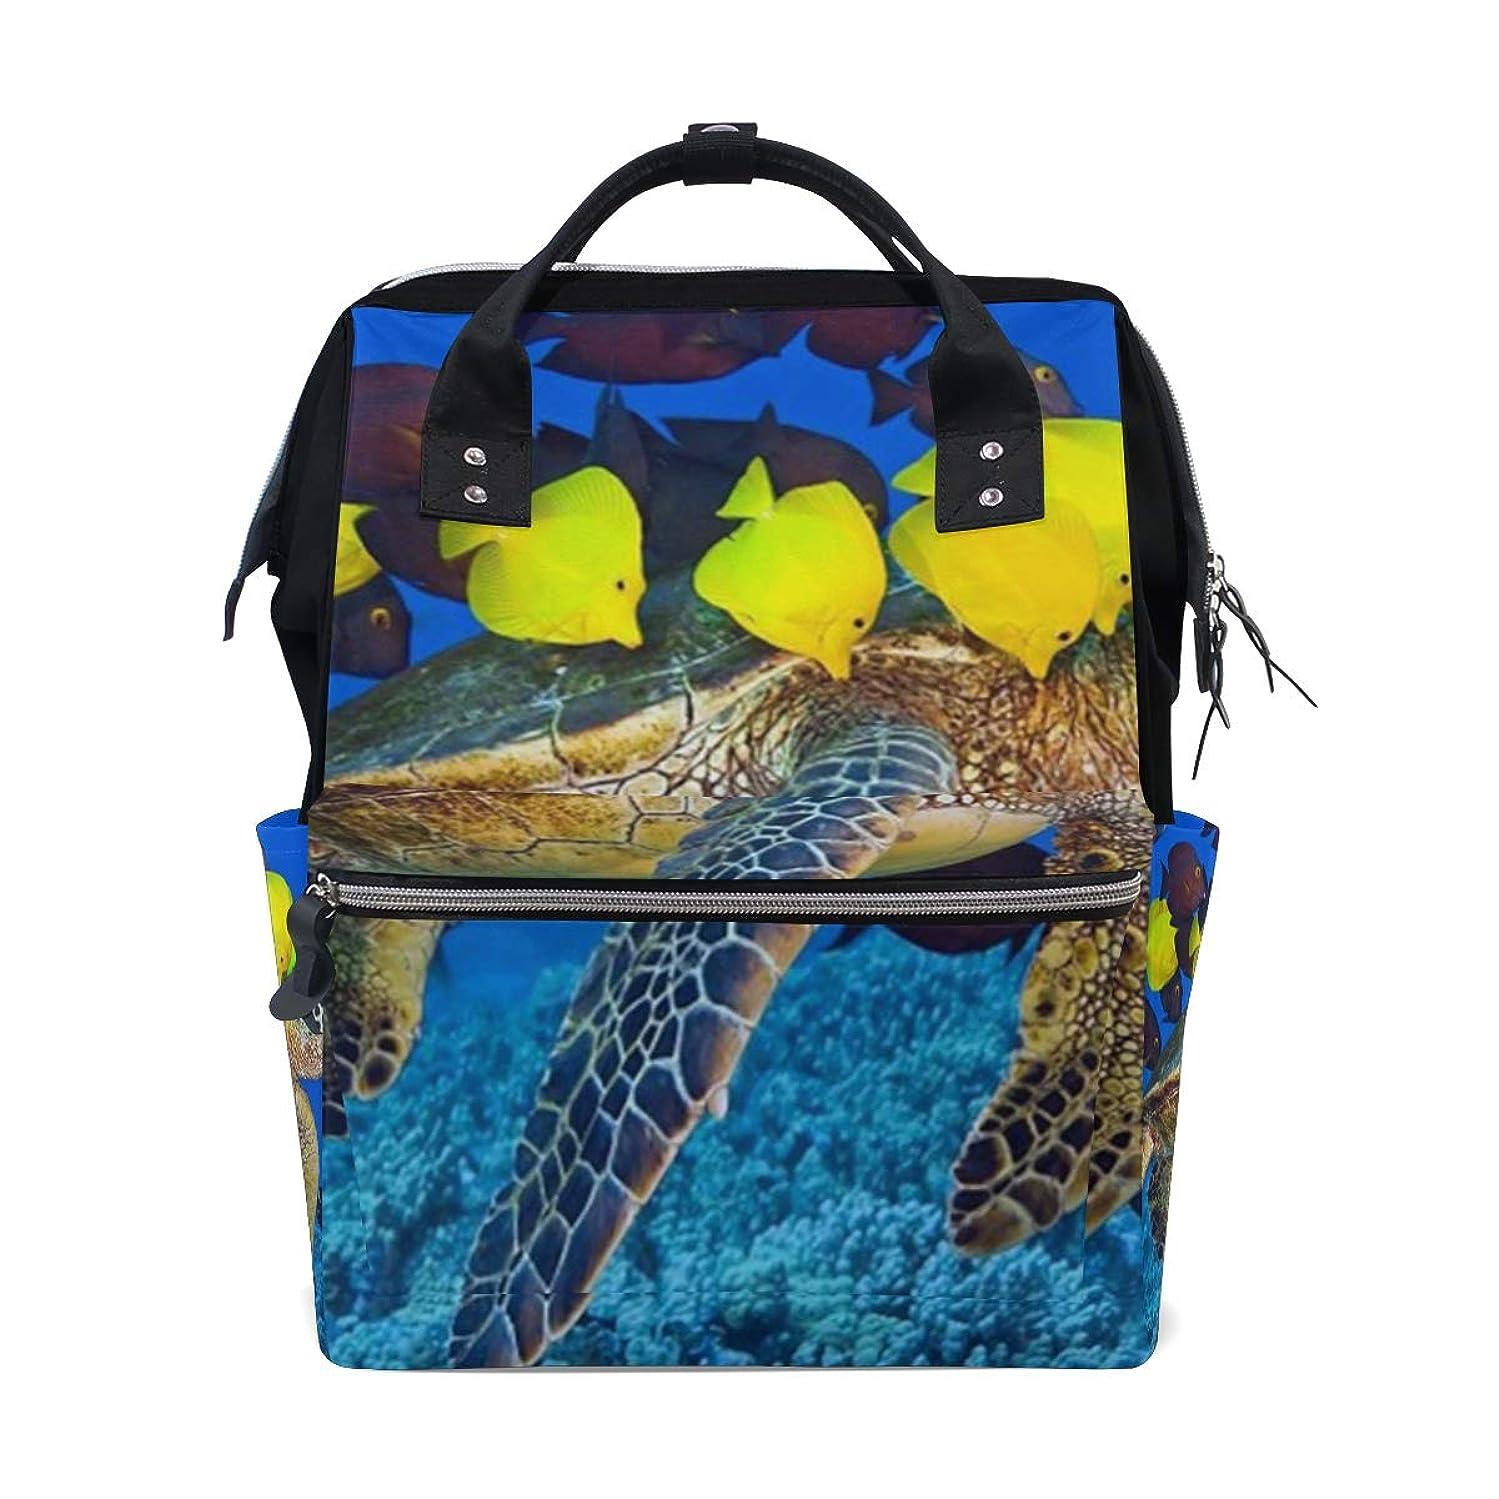 Underwater Sea Turtle Fishes School Backpack Large Capacity Mummy Bags Laptop Handbag Casual Travel Rucksack Satchel For Women Men Adult Teen Children